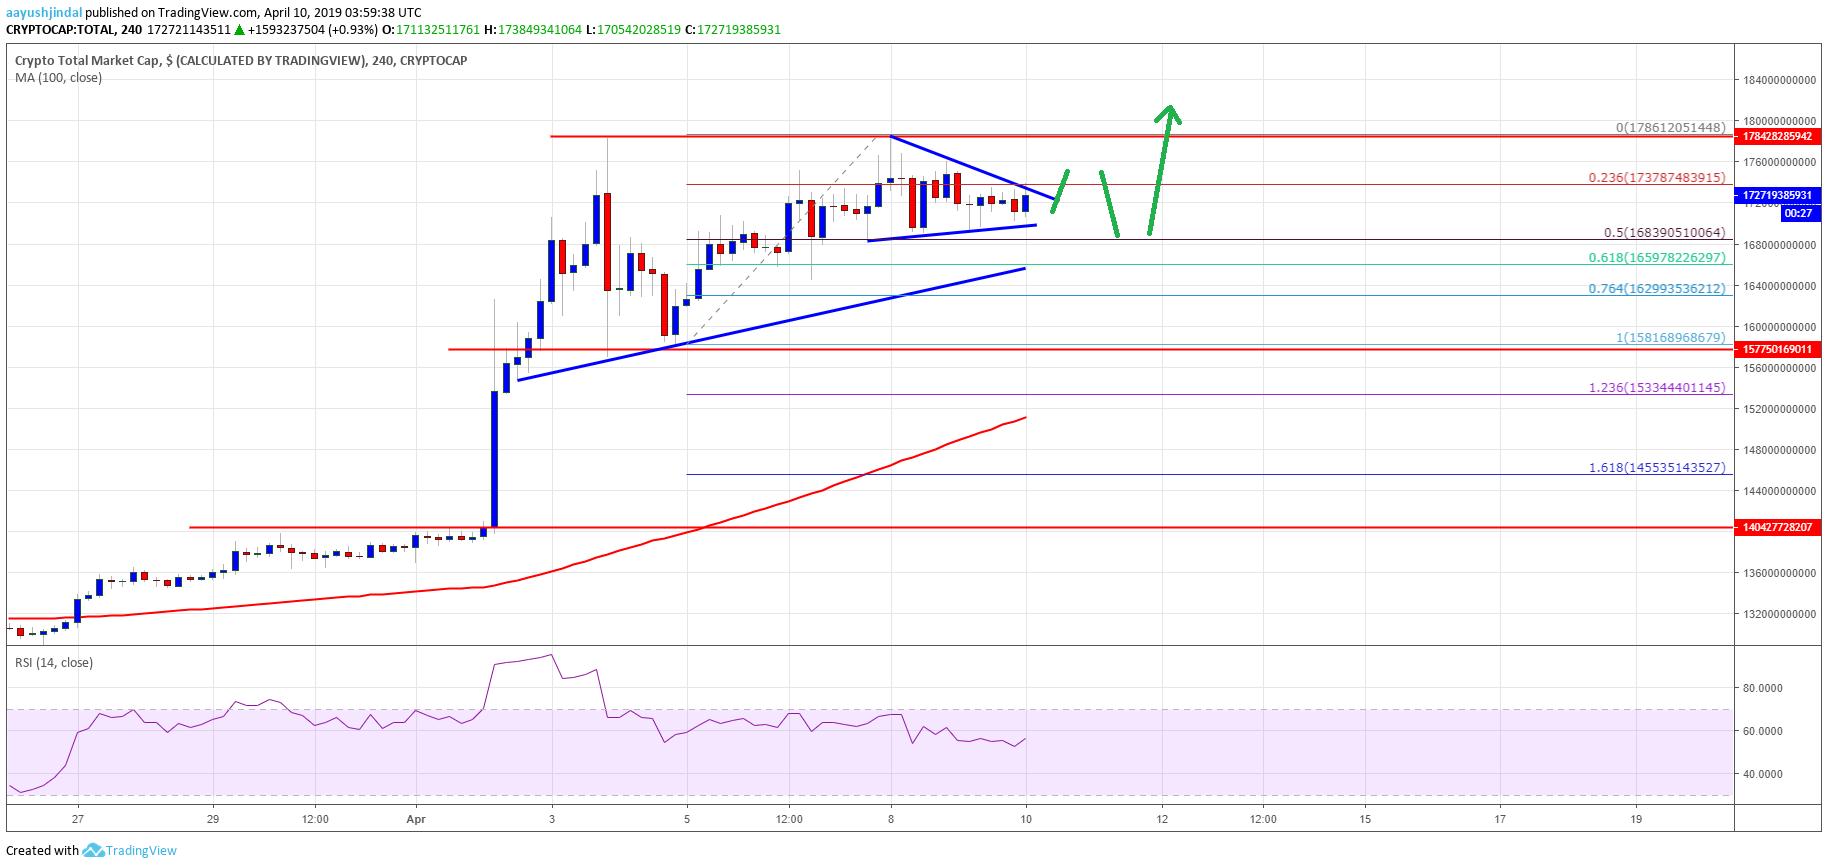 Crypto Market Trend Remains Bullish: EOS, Bitcoin Cash, TRX, ADA Price Analysis